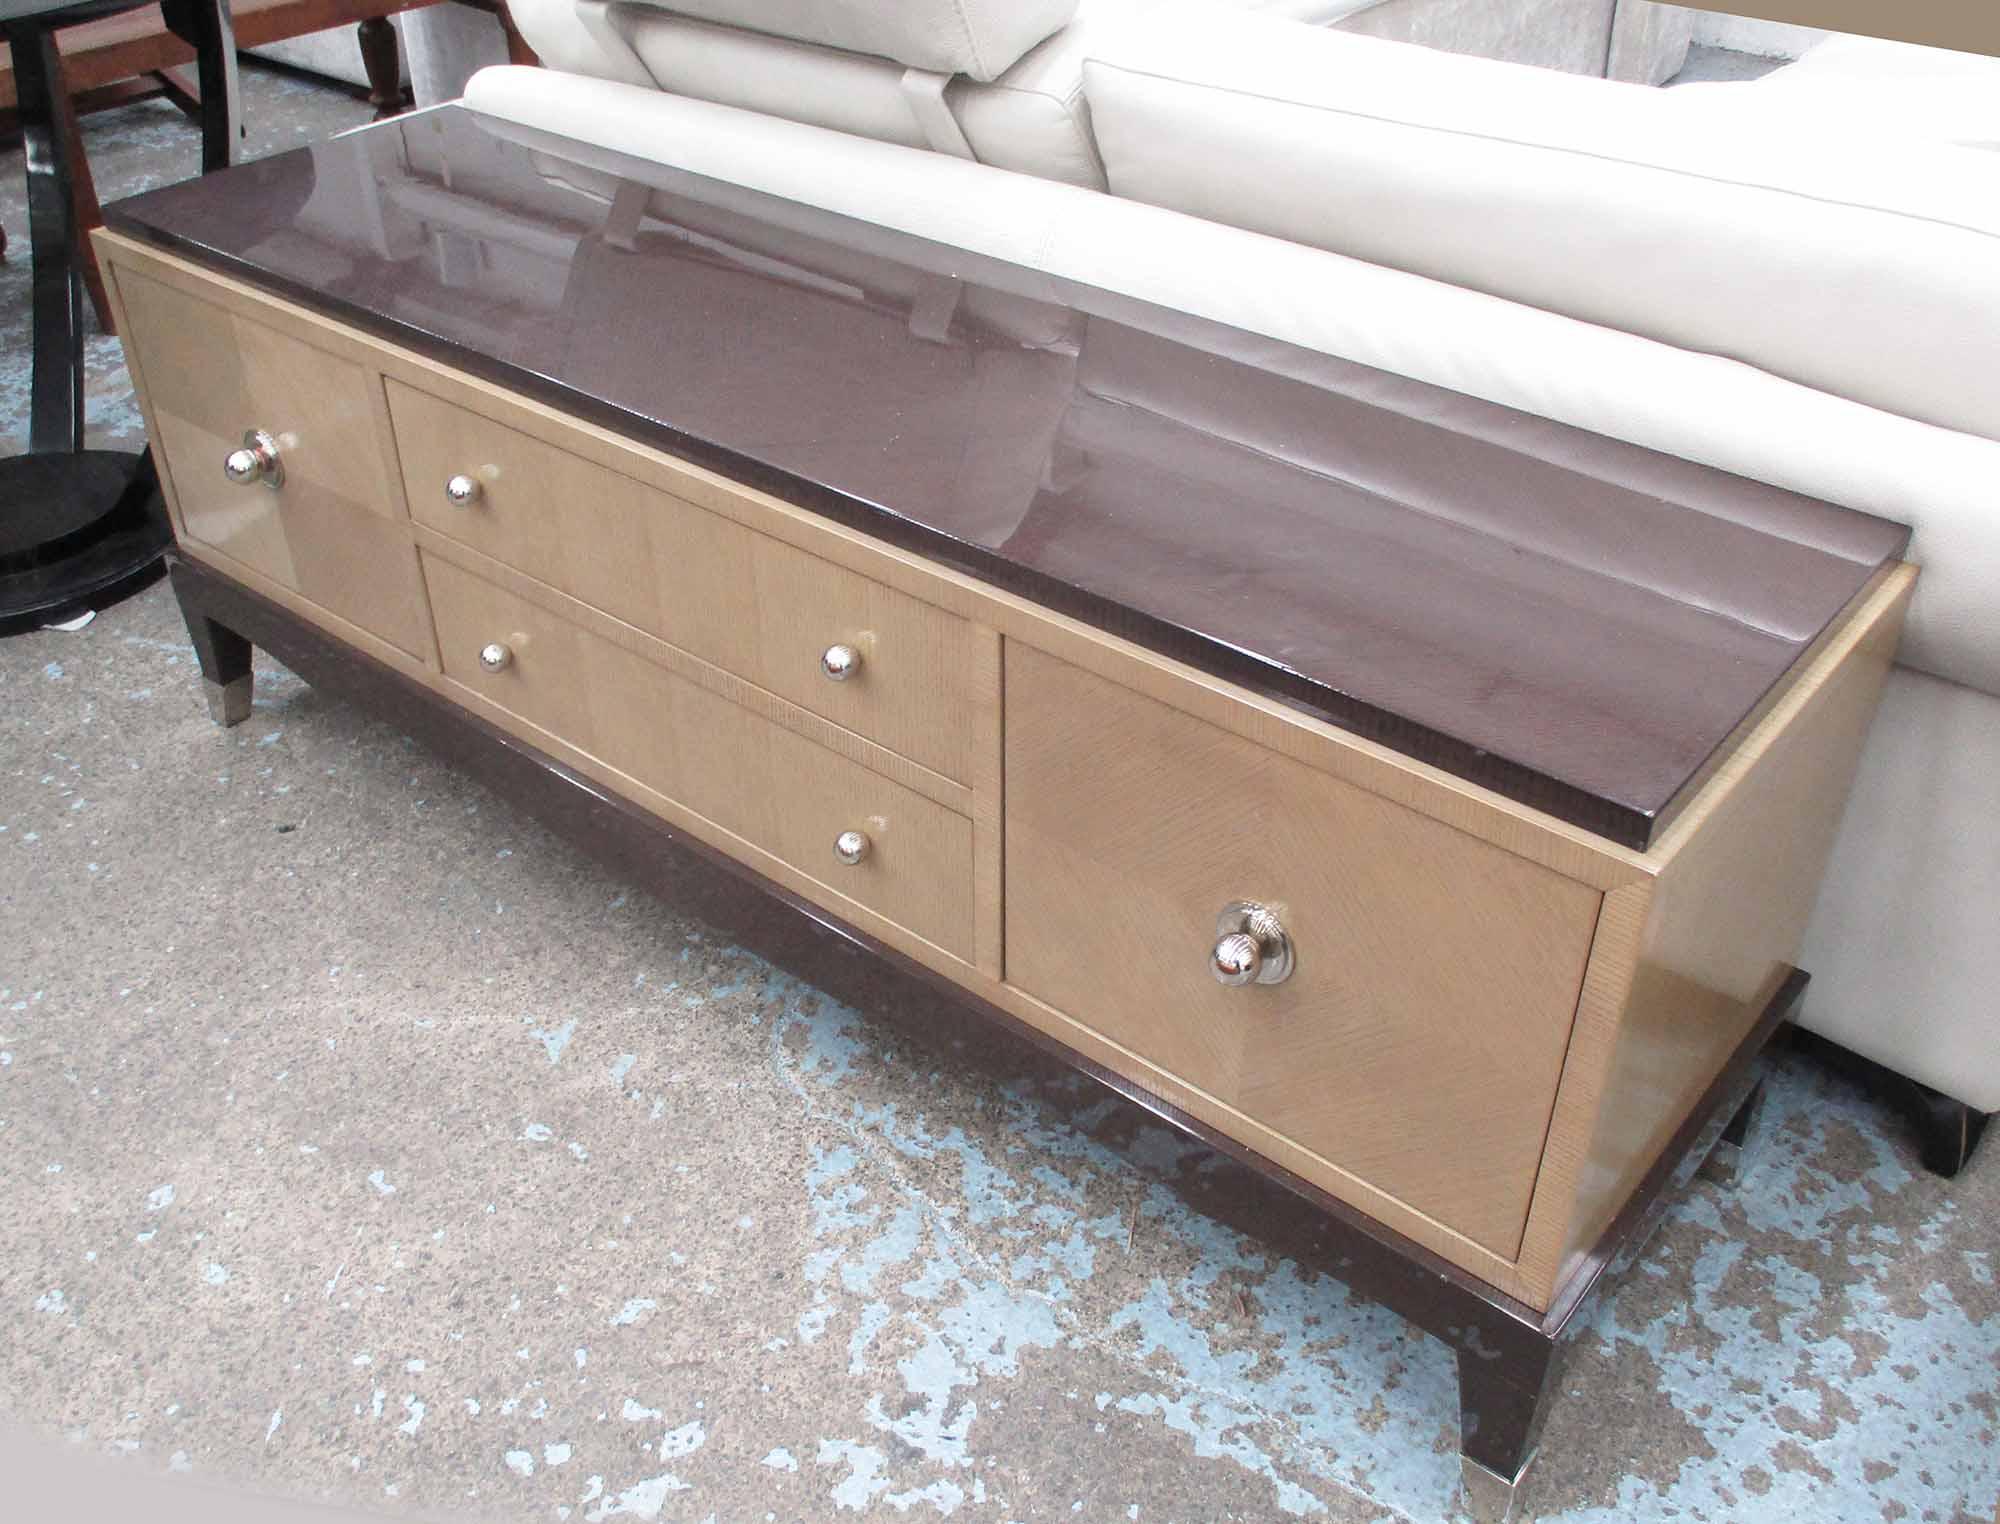 roche bobois sideboard model 39 grand hotel 39 180cm x 63cm h x 44cm. Black Bedroom Furniture Sets. Home Design Ideas